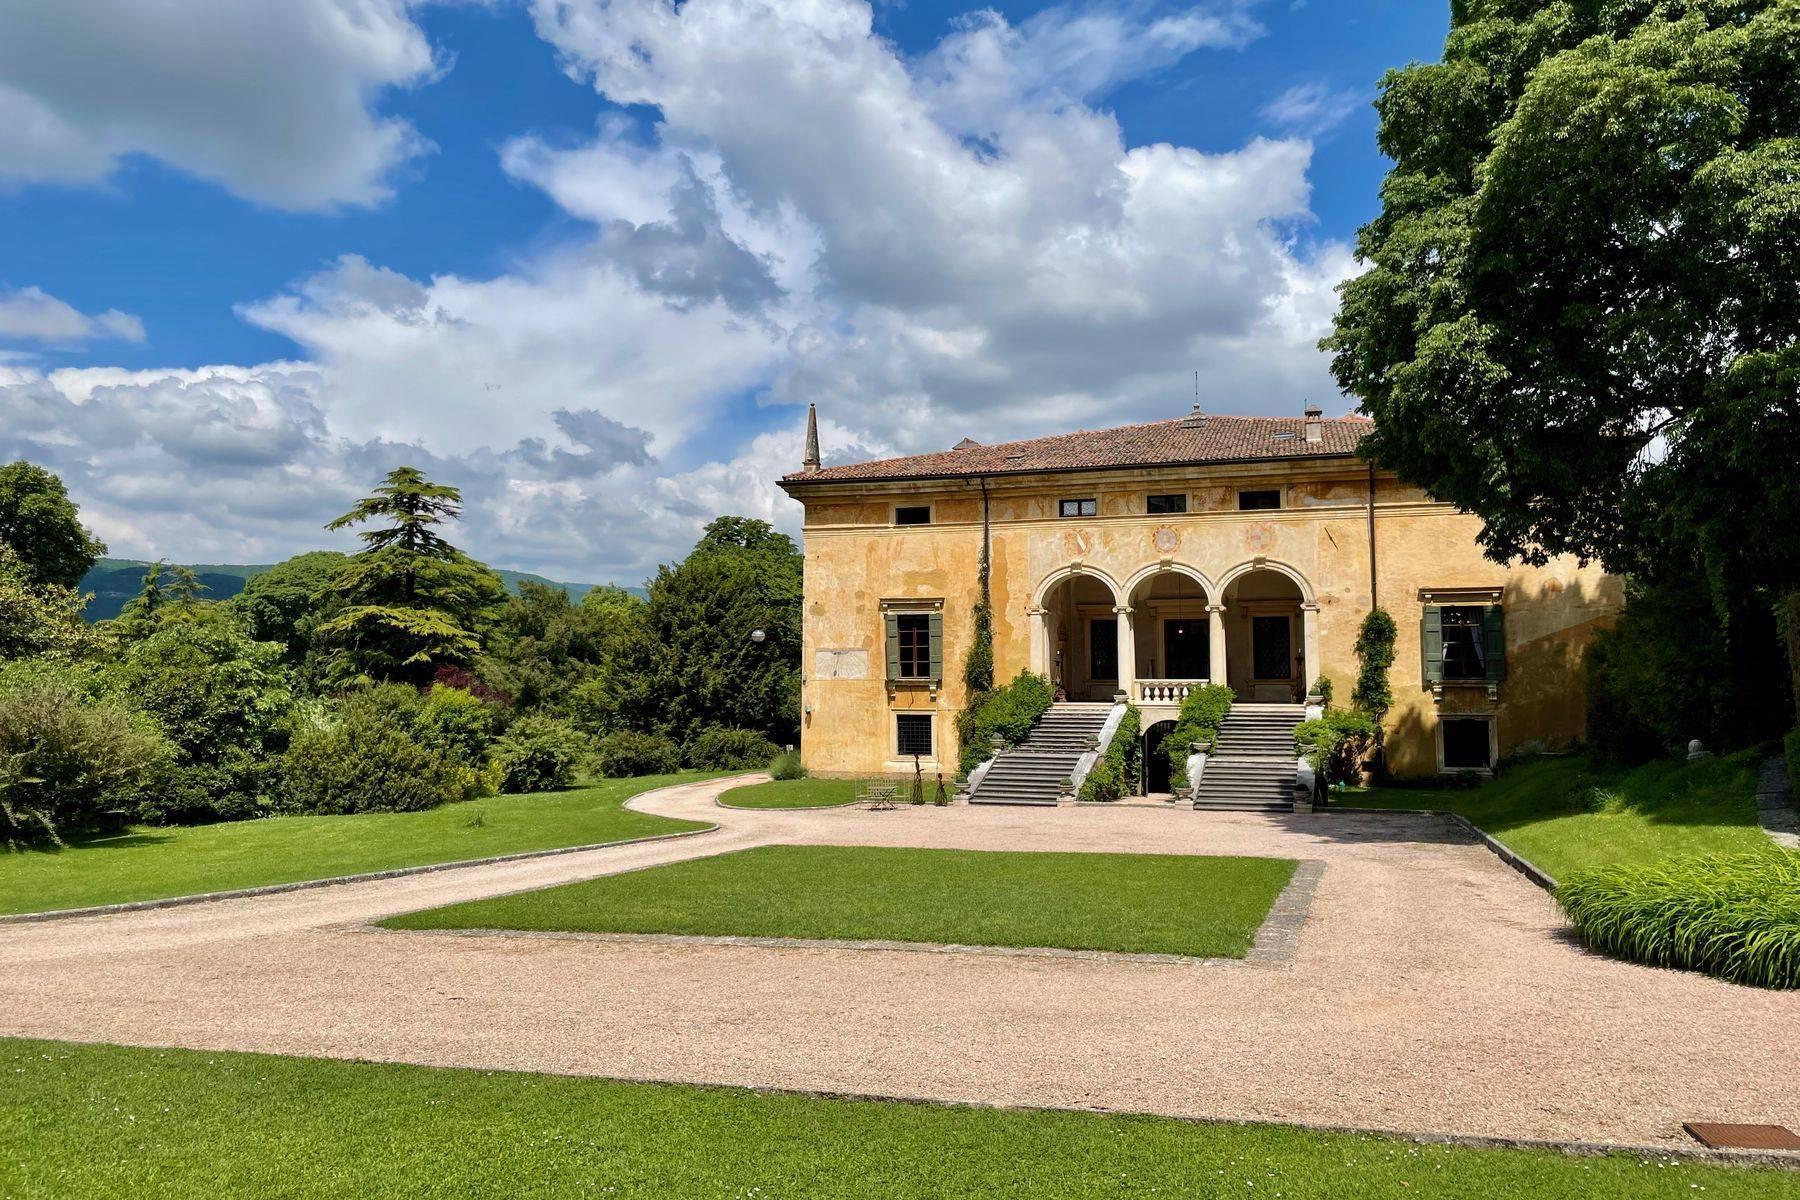 Affascinante villa Veneta a pochi minuti da Verona - 30